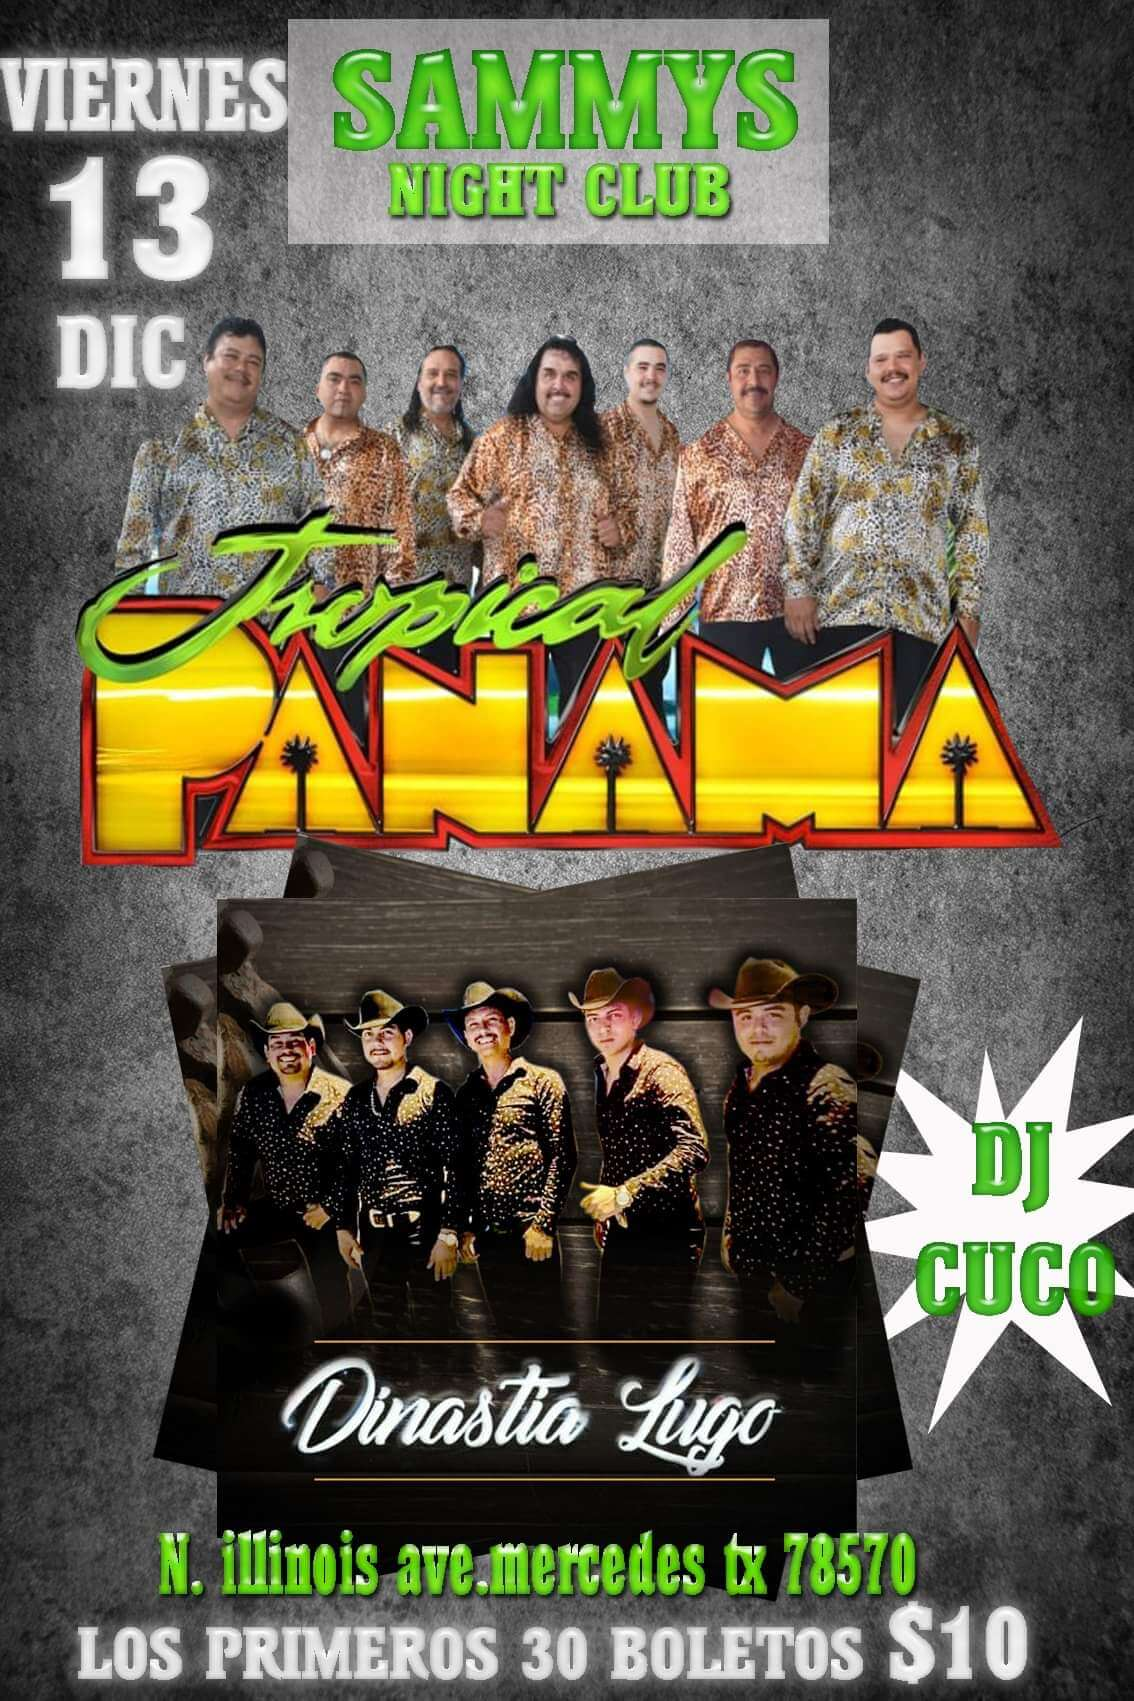 Tropical Panama event